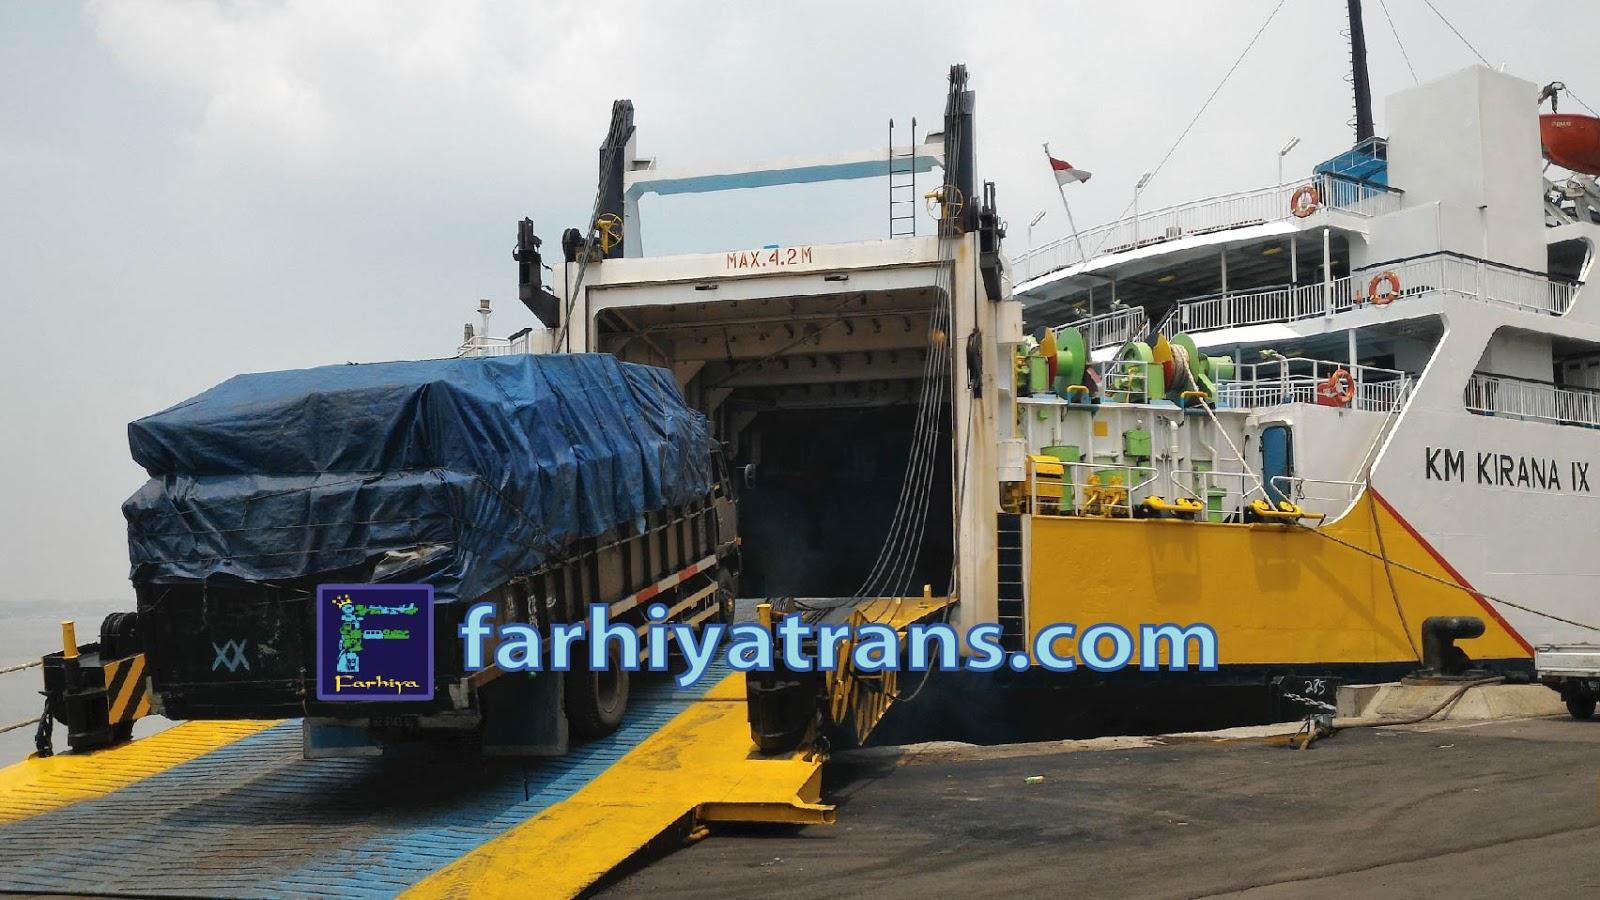 kirim truk colt diesel kapal cargo ferry roro surabaya jakarta makassar balikpapan banjarmasin pontianak lampung medan aceh padang jambi riau pekanbaru